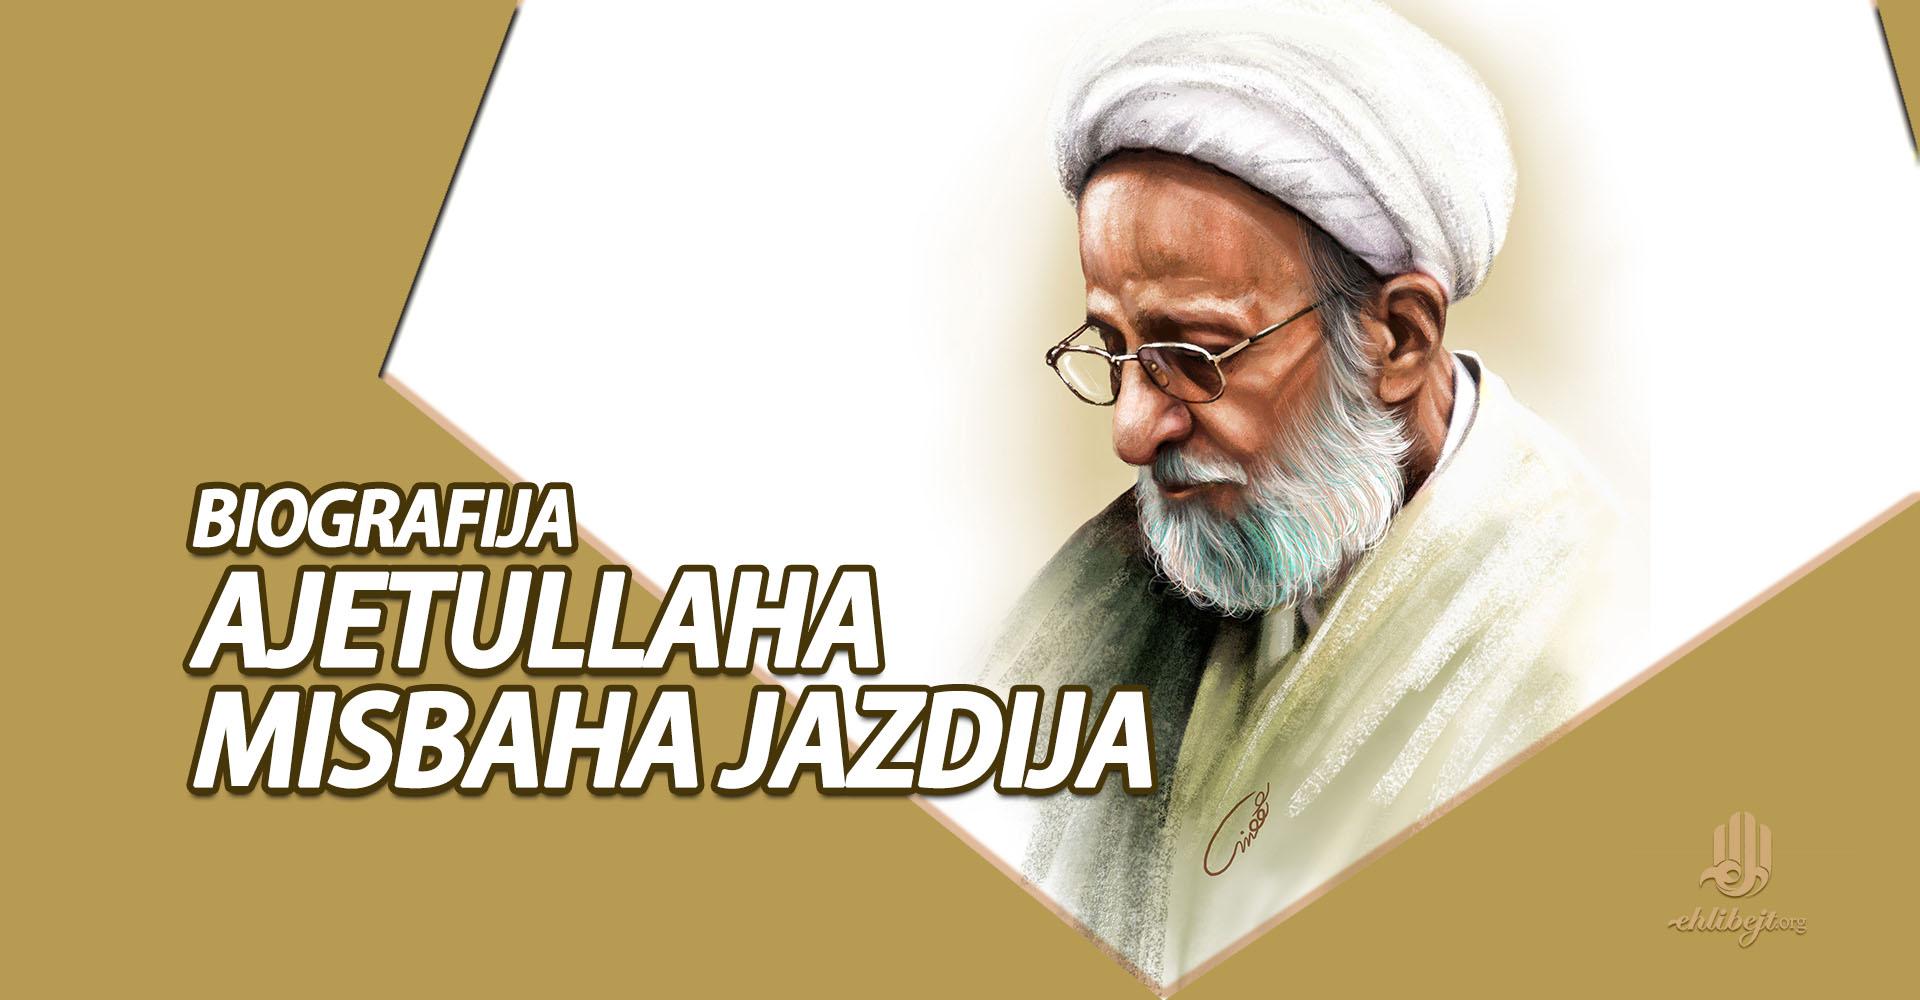 Biografija ajetullaha Misbaha Jazdija